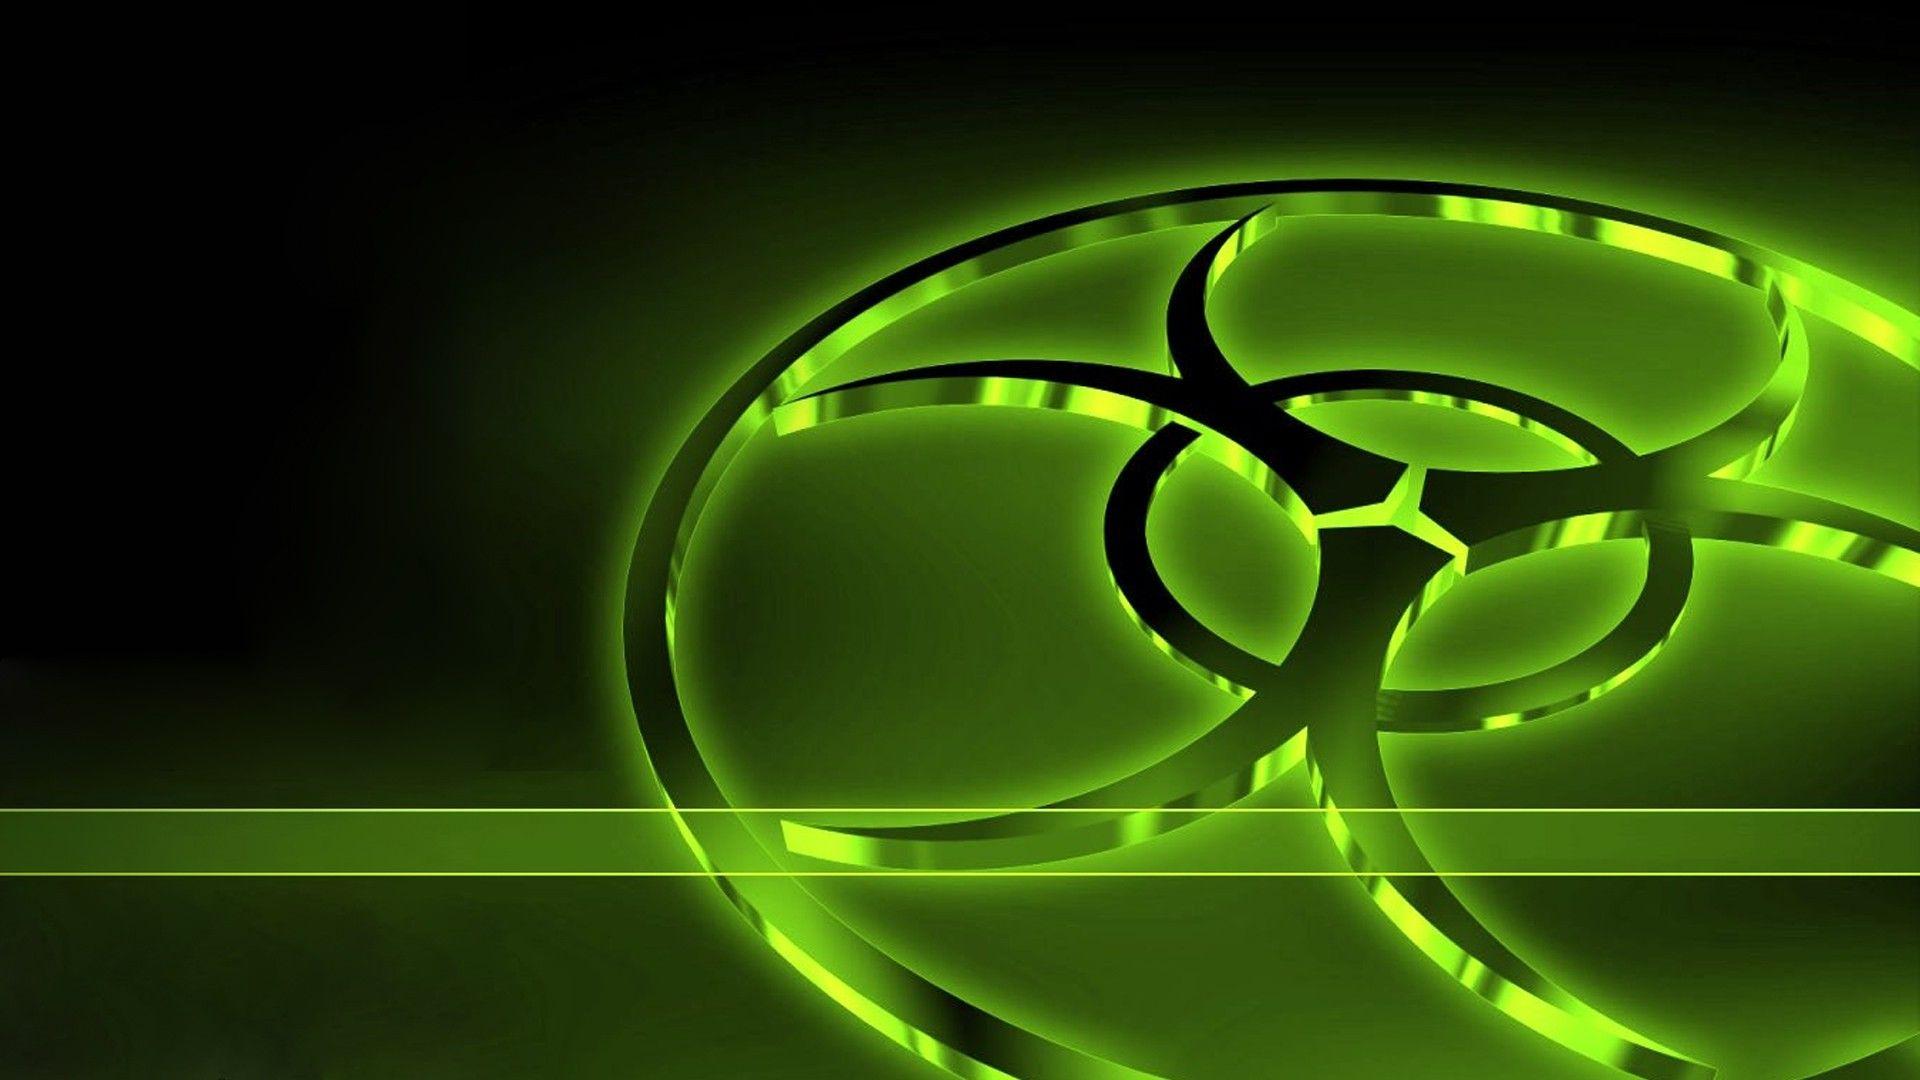 Neon Green Wallpapers Widescreen For Desktop Background Wallpaper HD Resolution 1920x1080 Px 19130 KB